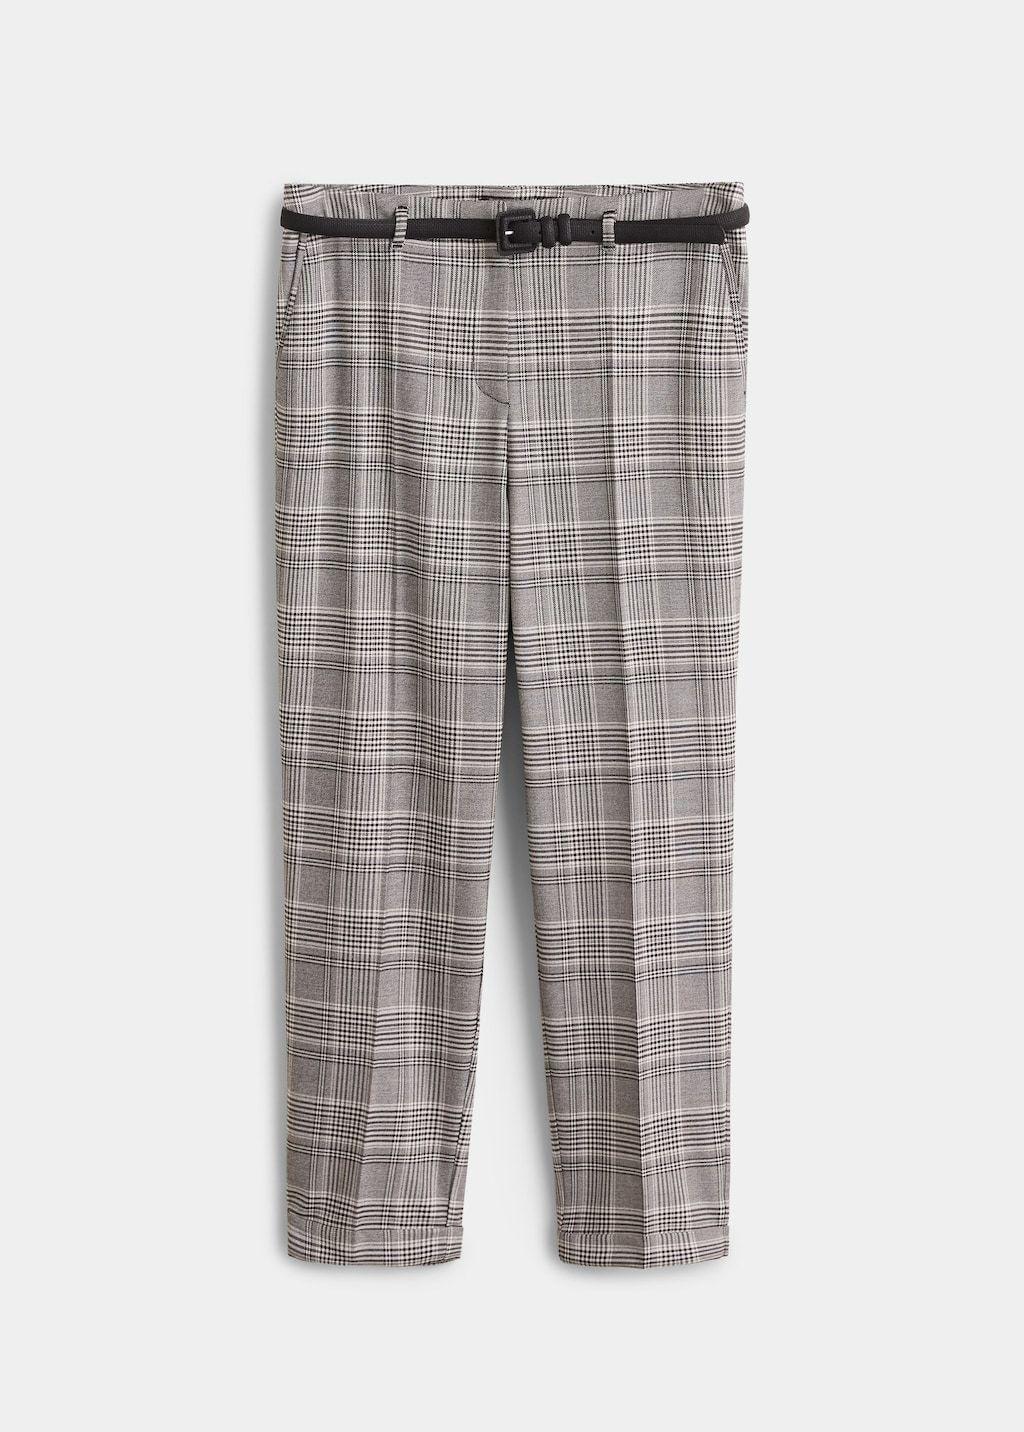 Pantalon Principe De Gales Pantalones Tallas Grandes Pantalones Tallas Grandes Pantalones Principe